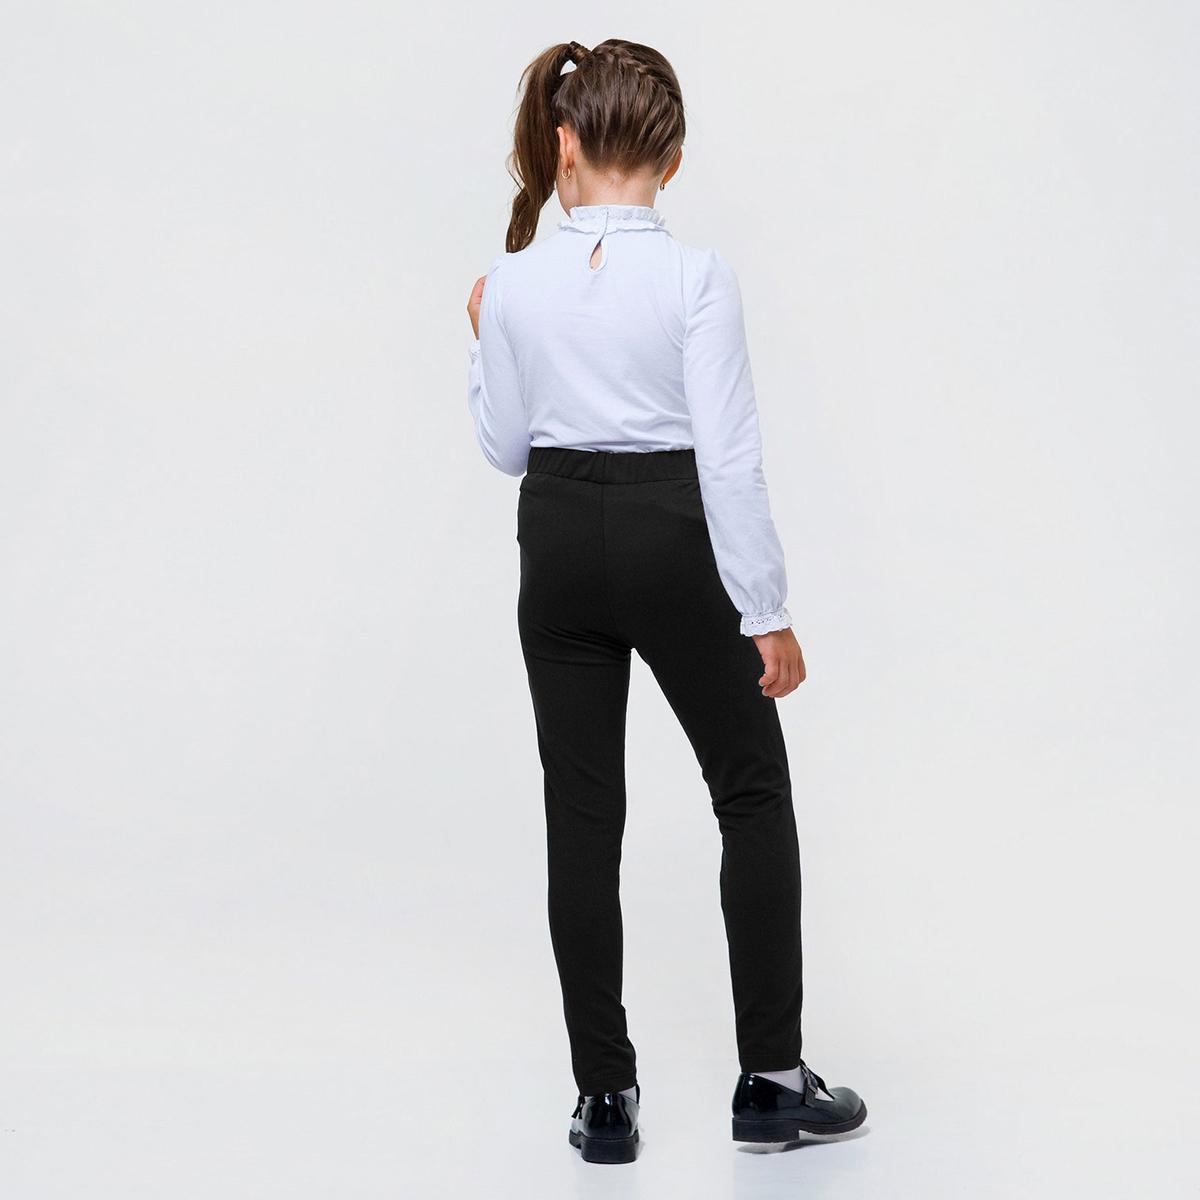 Купить Брюки, джинсы, шорты, Брюки Smil Stretch Black, р. 128 115426 ТМ: SMIL, черный